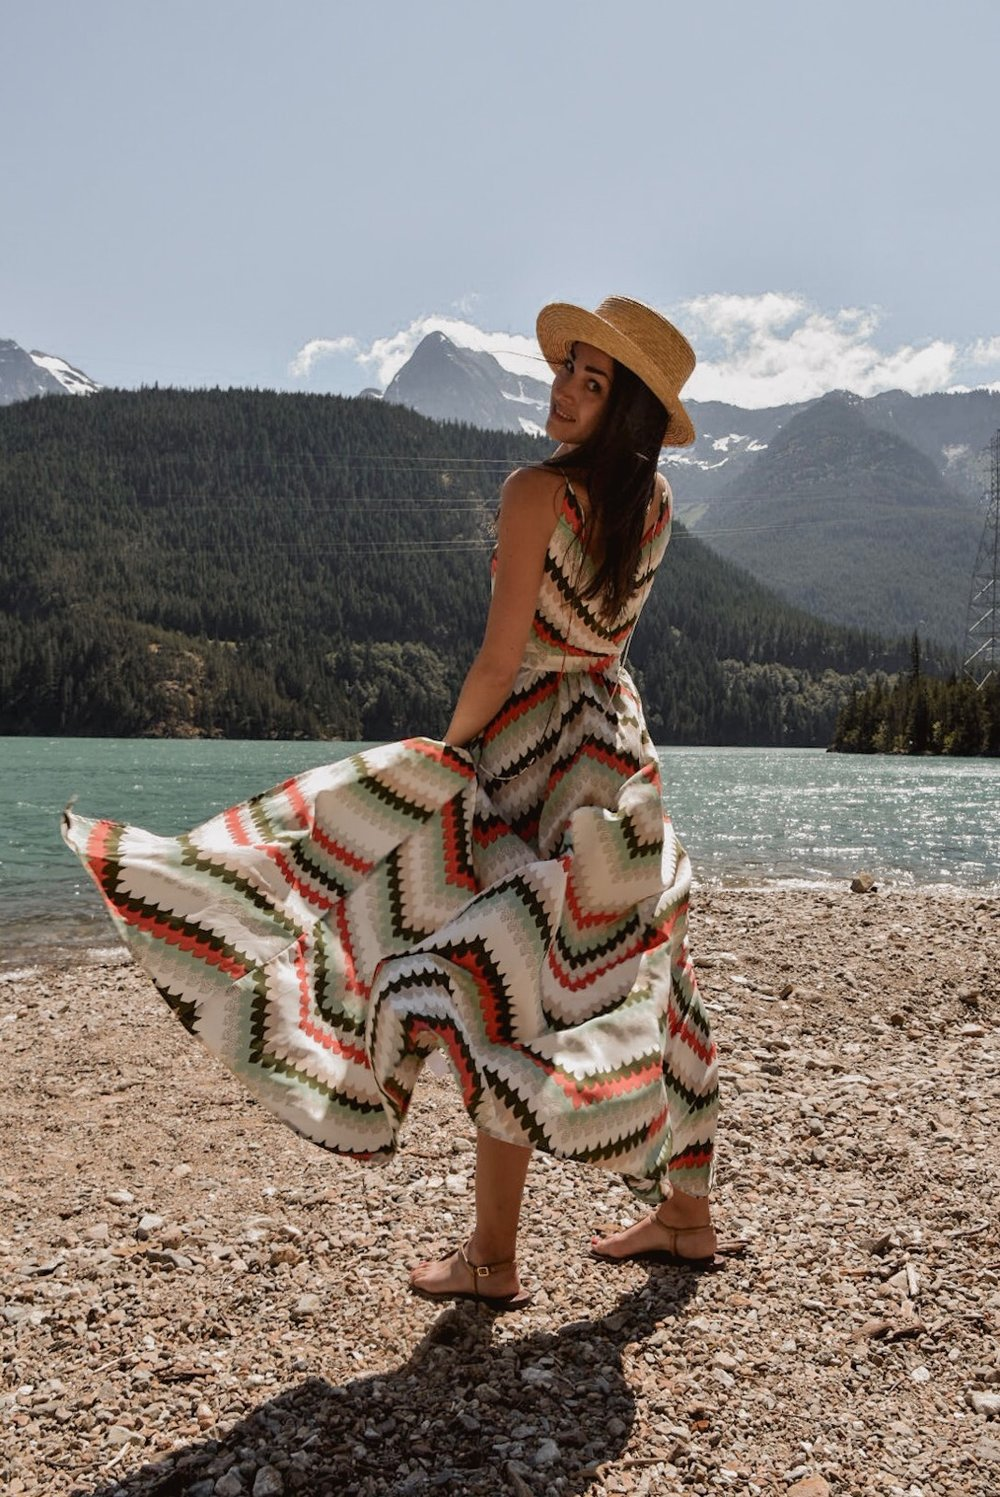 fashionrouse-diablolake-northcascades-photoshoot-fashion-blogger-pacificnorthwest-brittneycouture